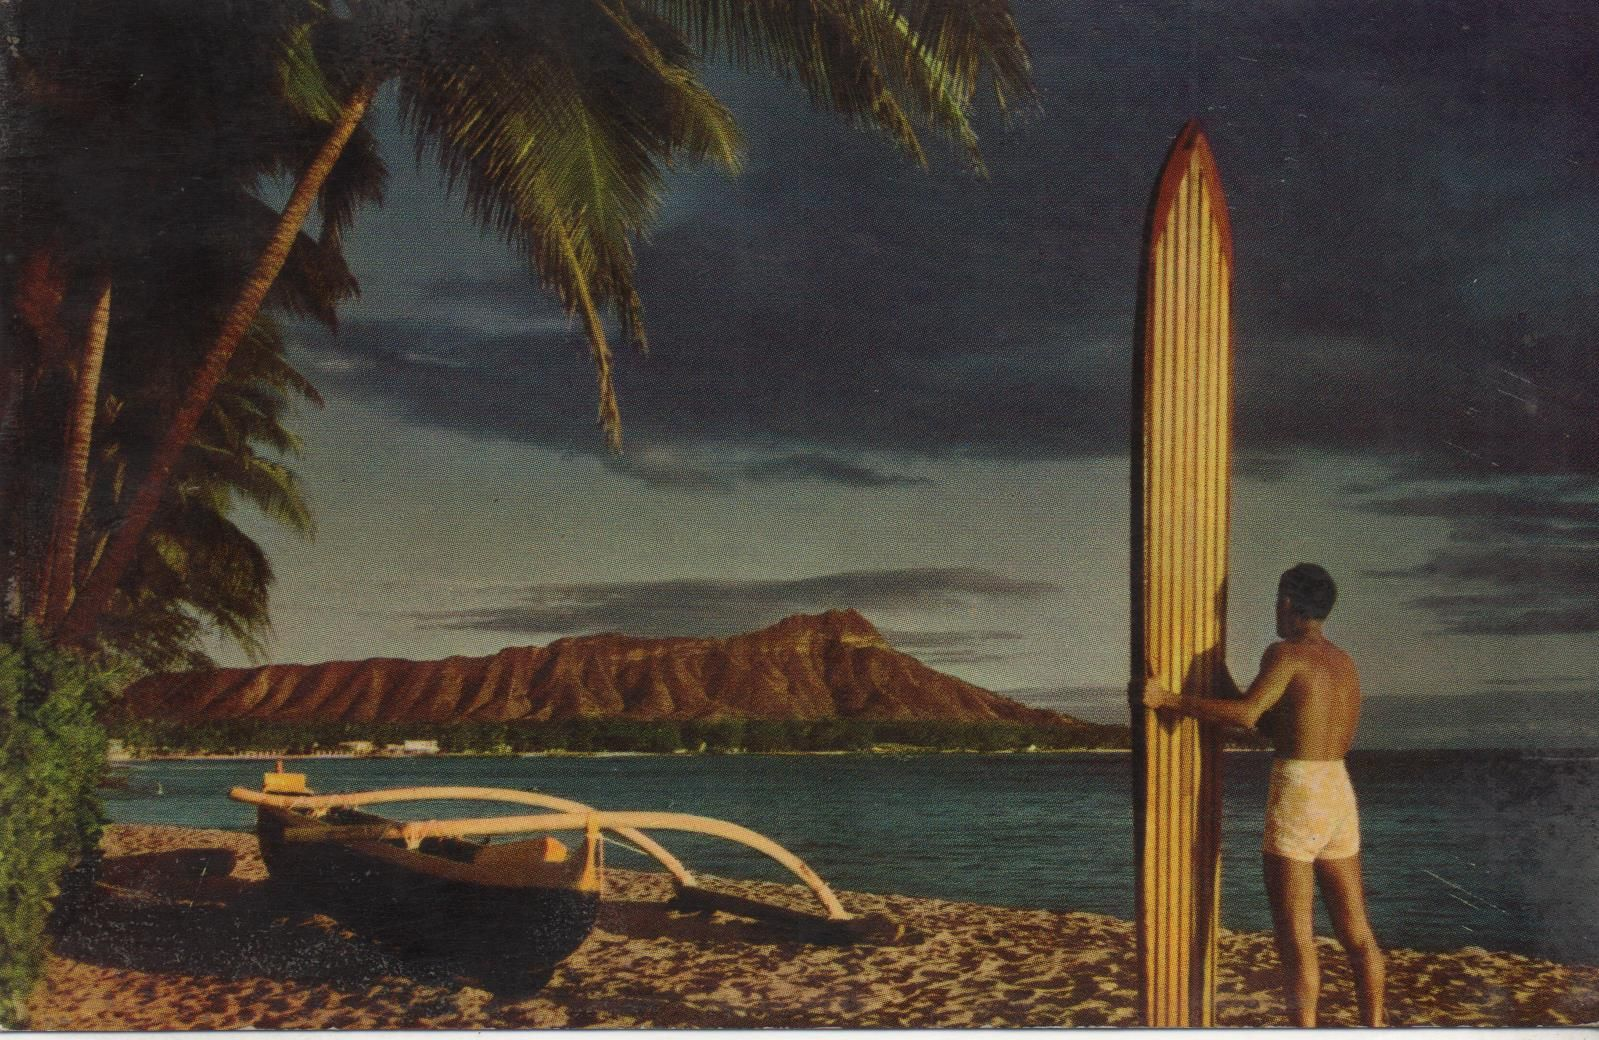 1954 Postcard. Hagins collection.